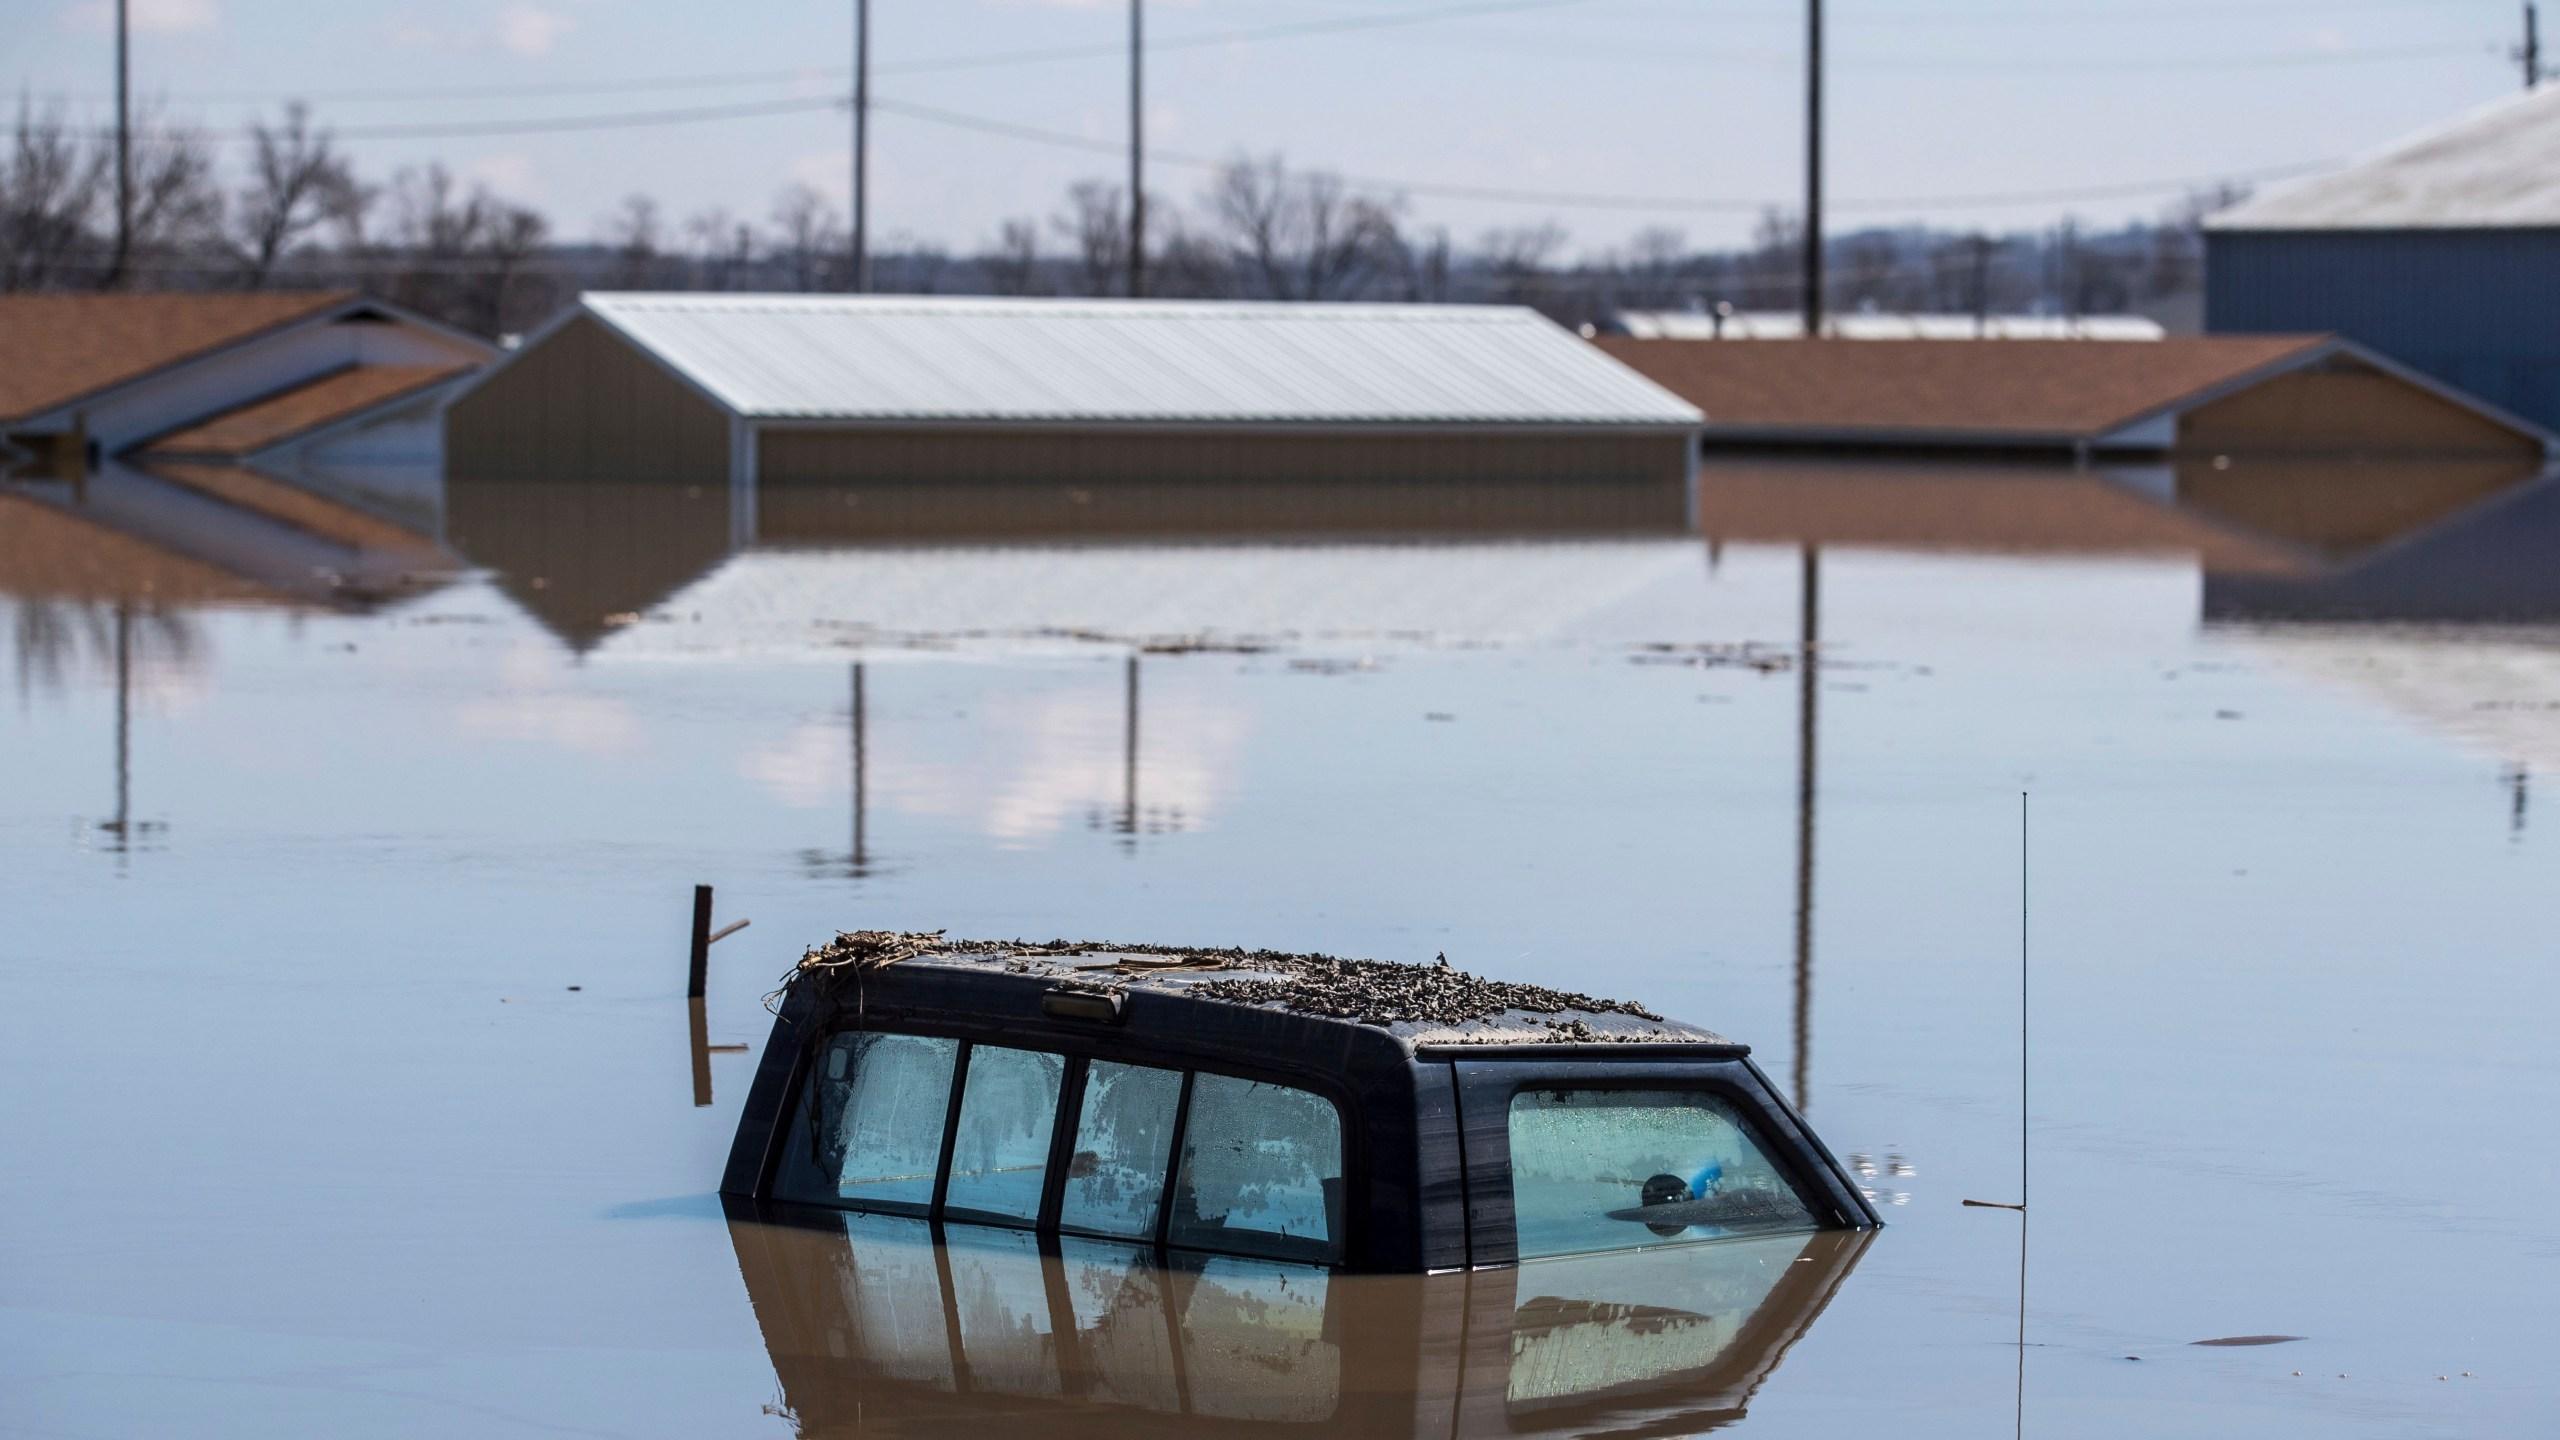 Winter_Weather_Flooding_50330-159532.jpg96877509